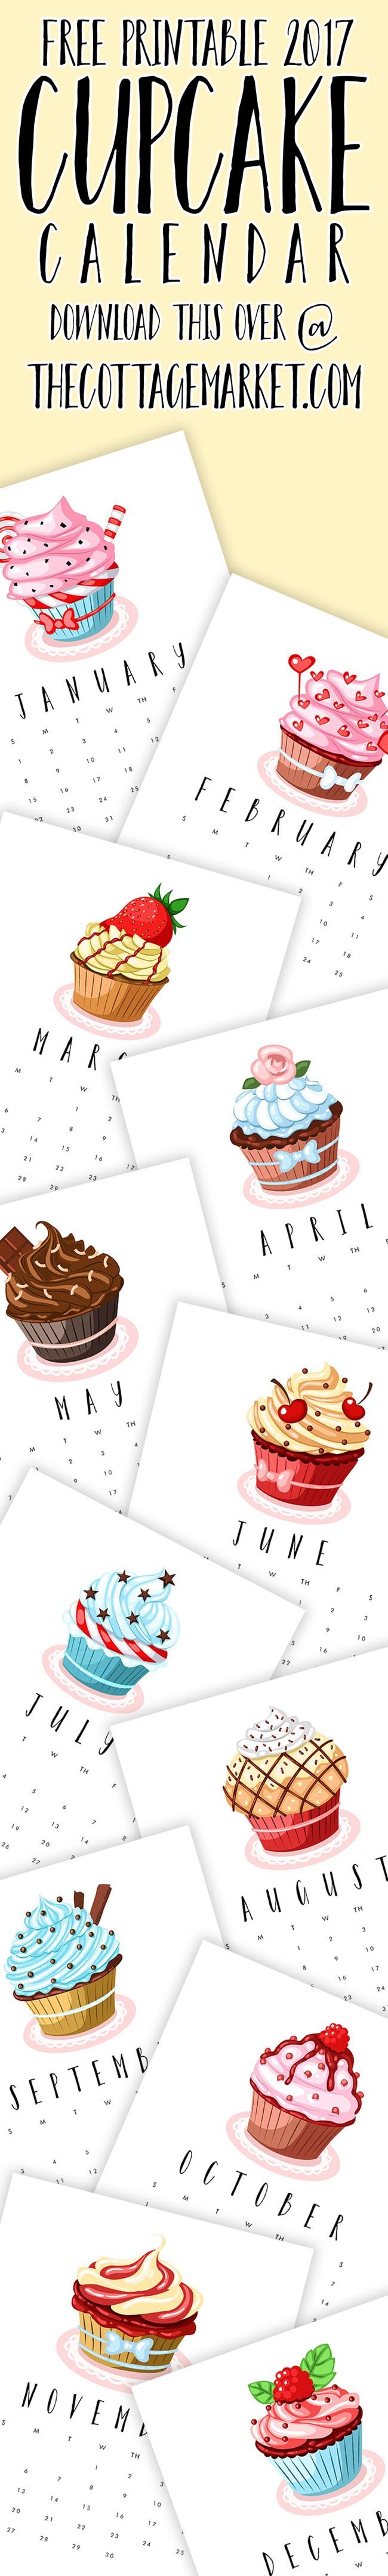 Free 2017 Printable Calendars - Cupcakes